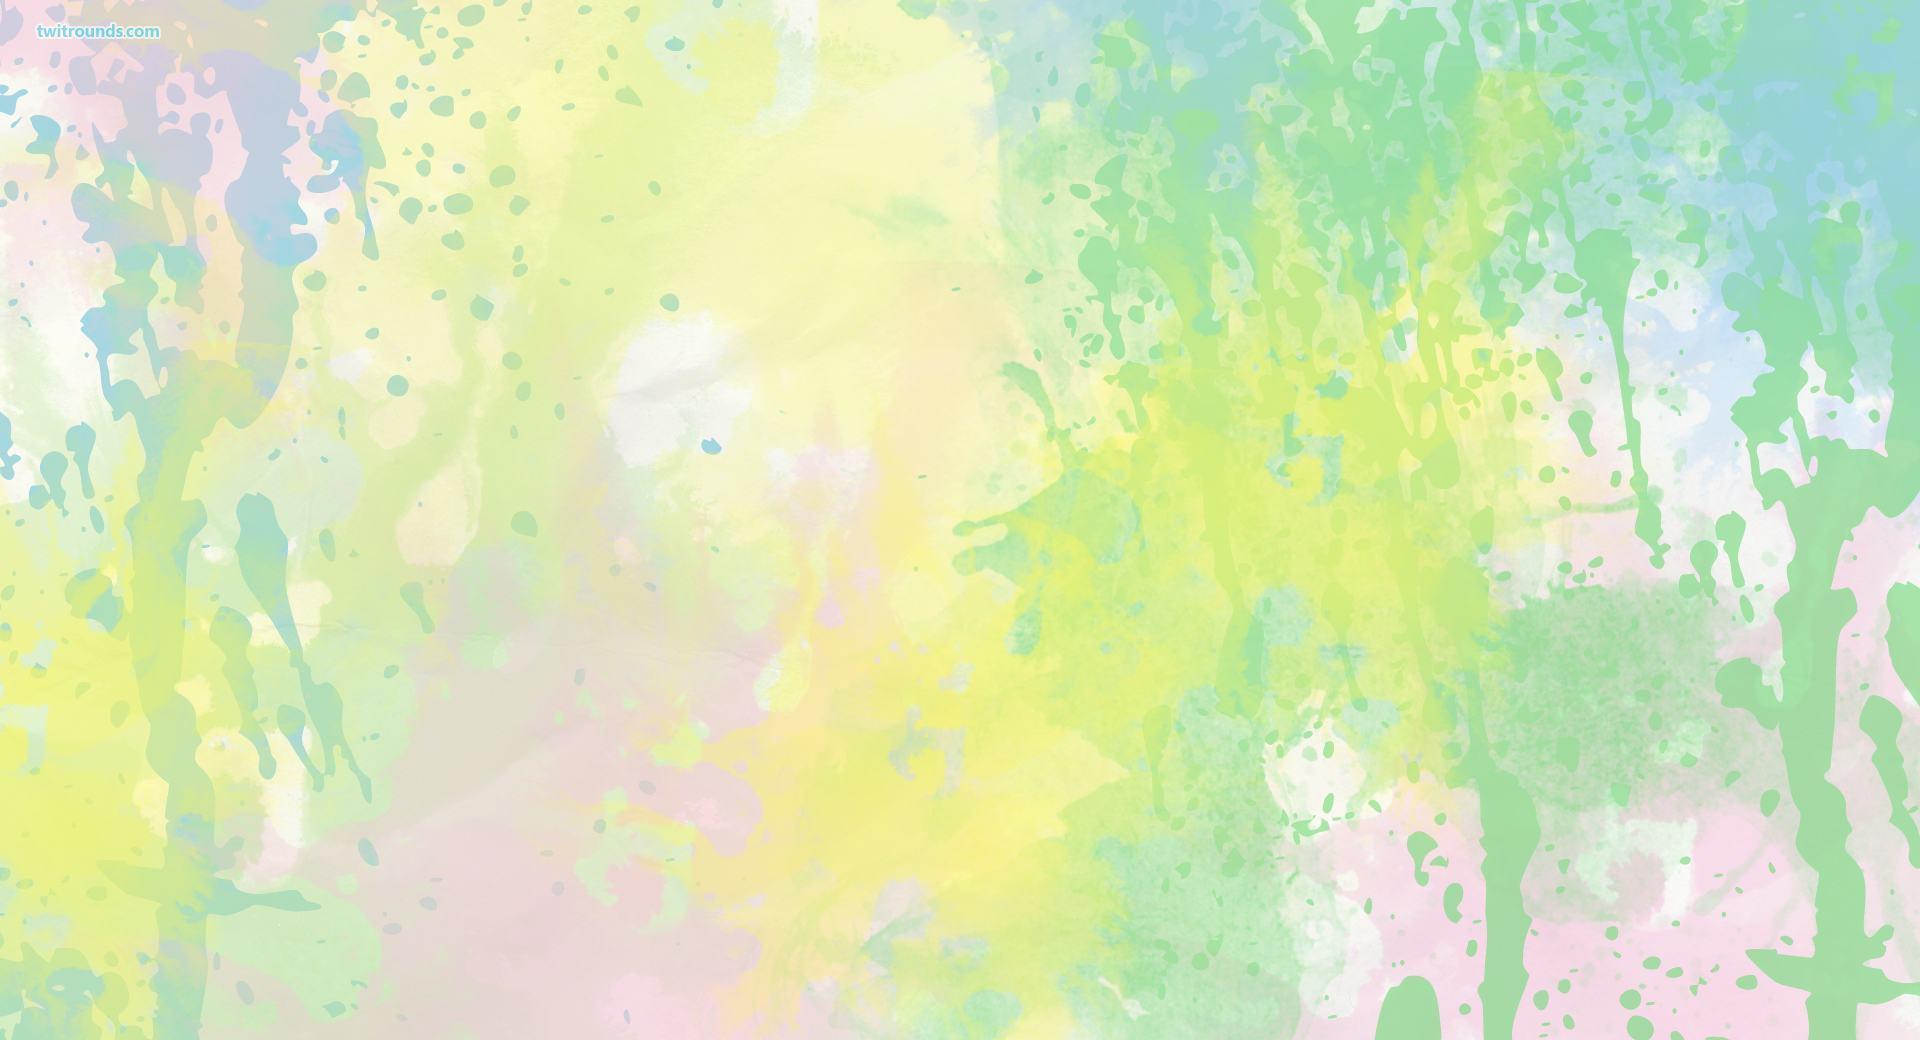 Watercolor Backgrounds - Wallpaper Cave